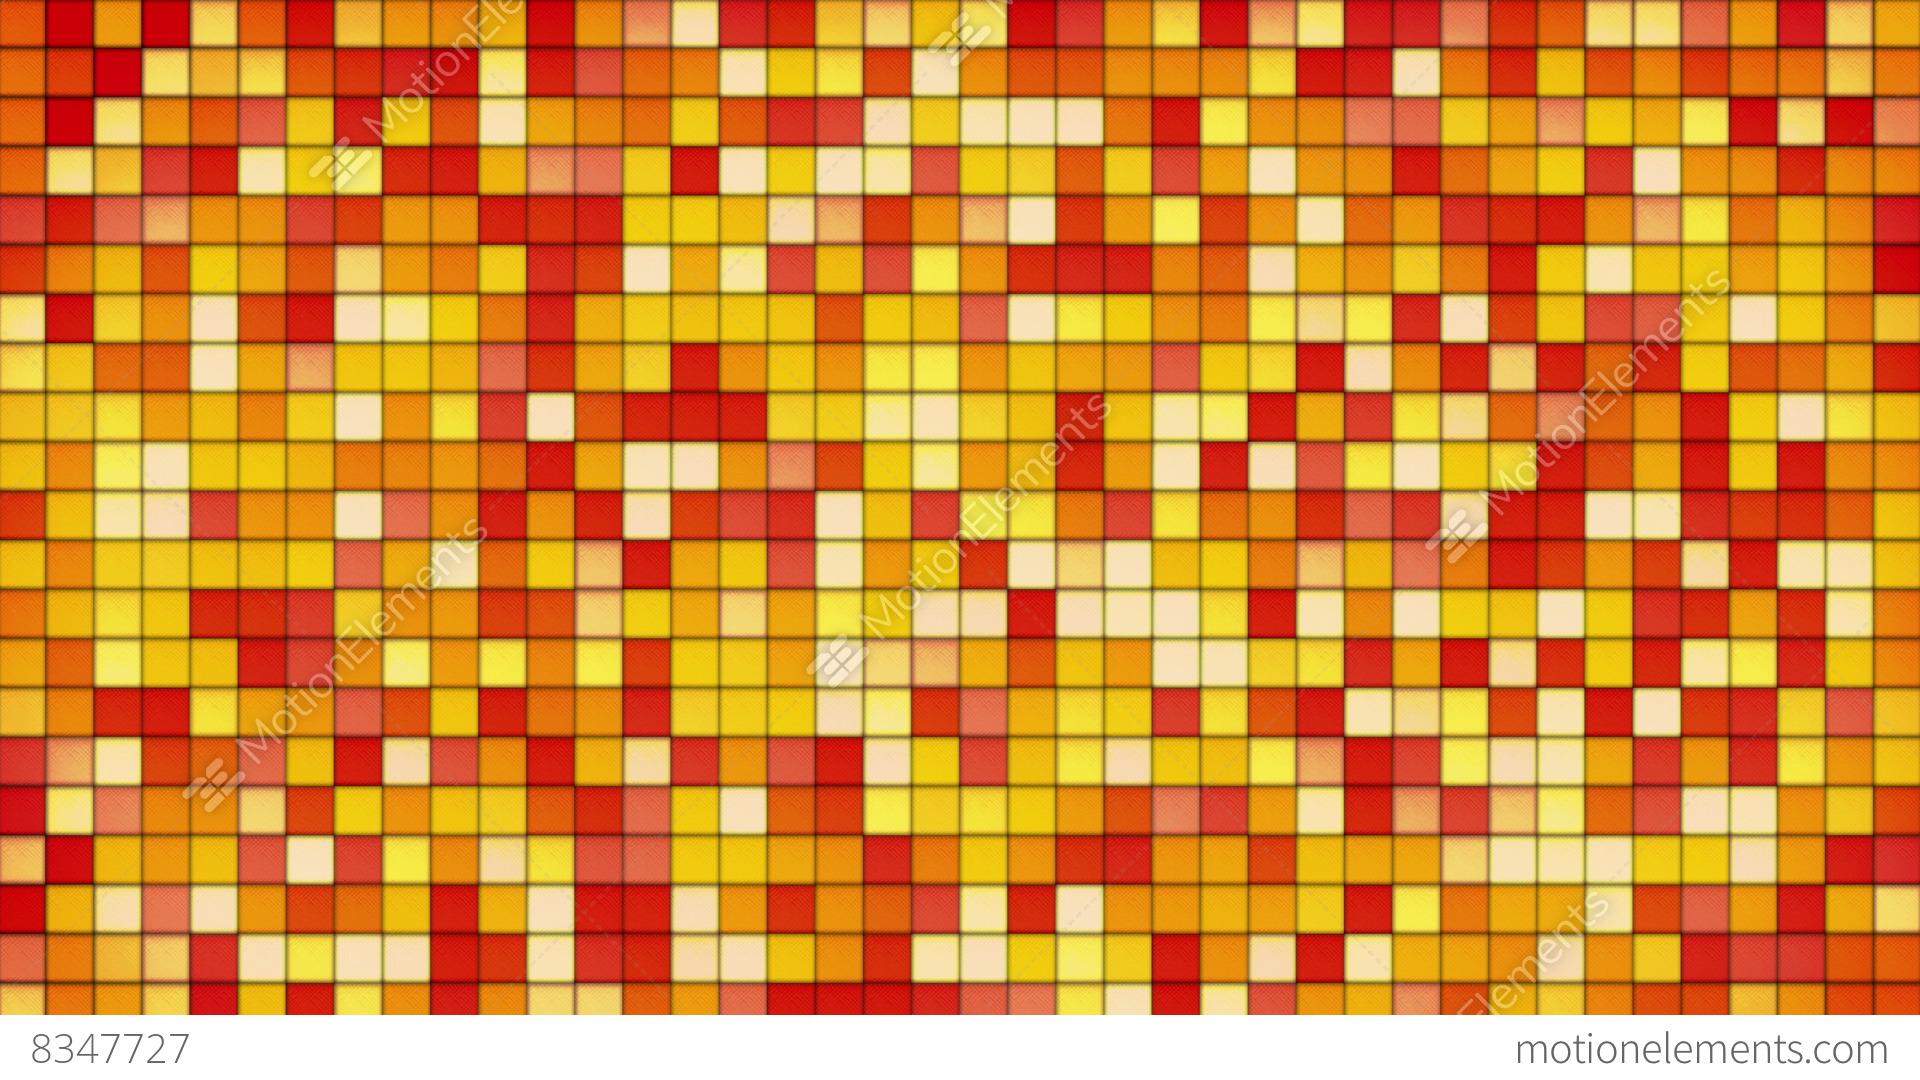 Orange Tiles Gl Mosaic Seamless Loop Background 4k Stock Video Footage